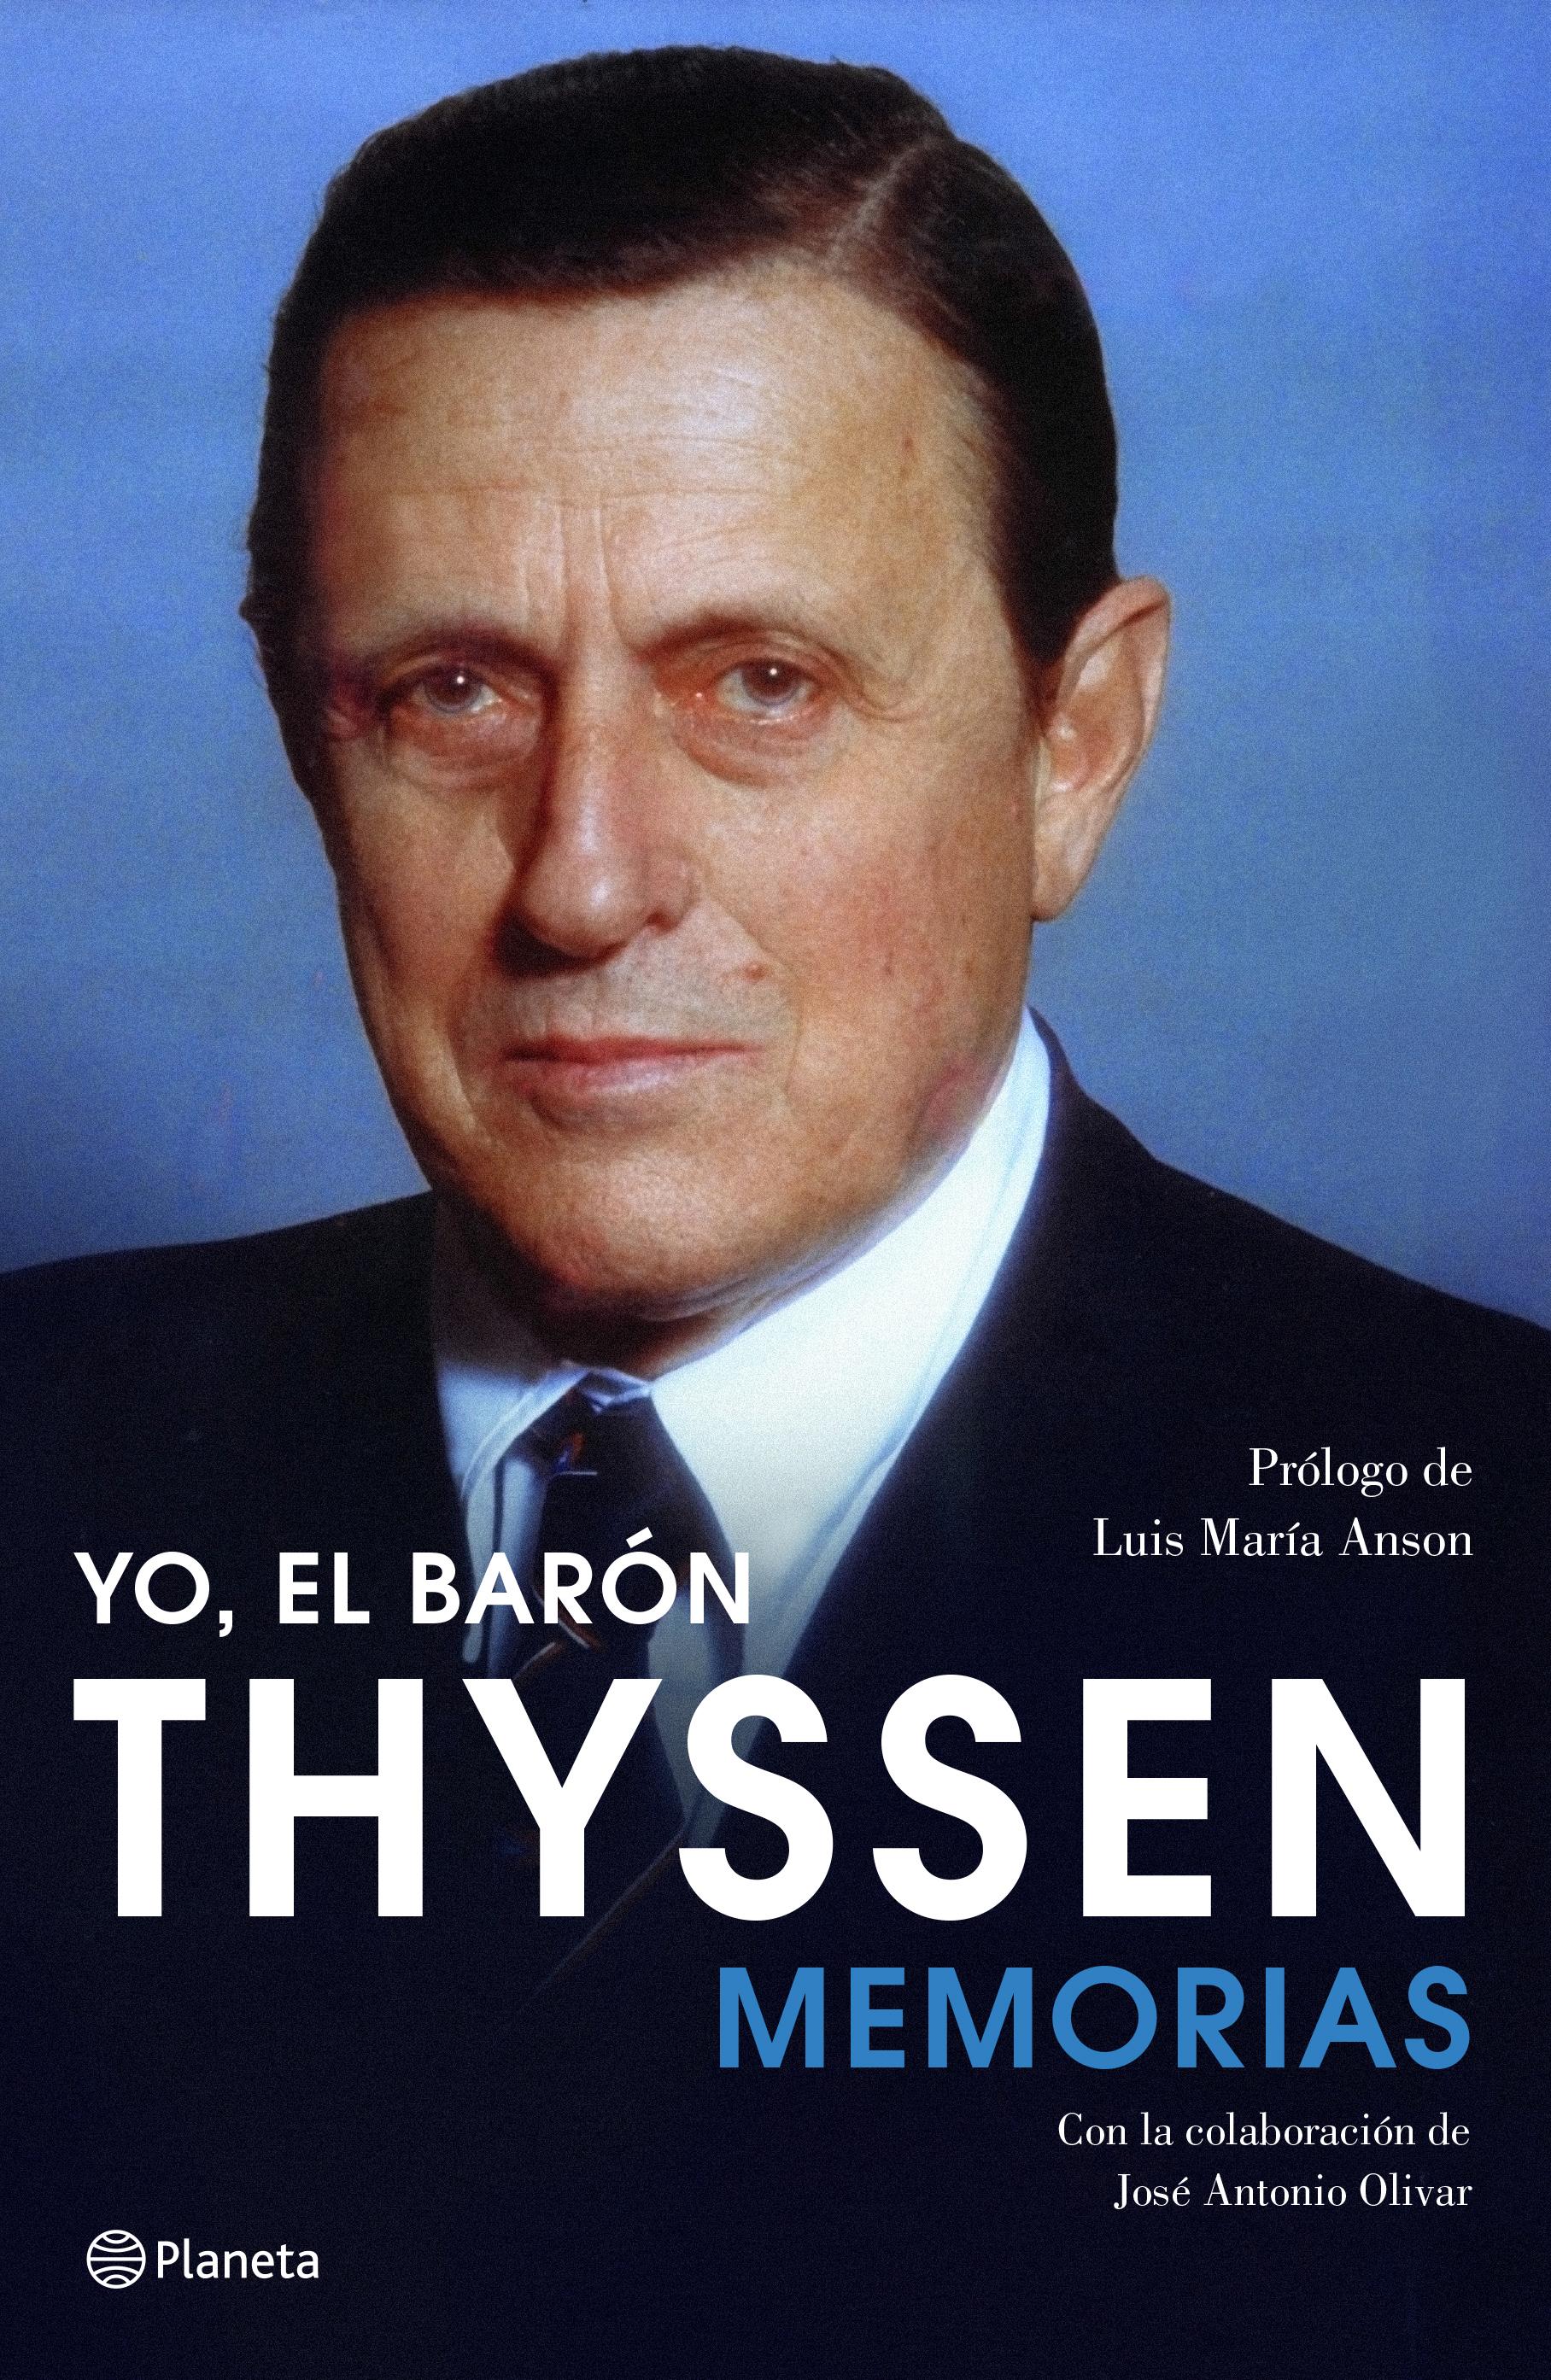 memorias-thyssen